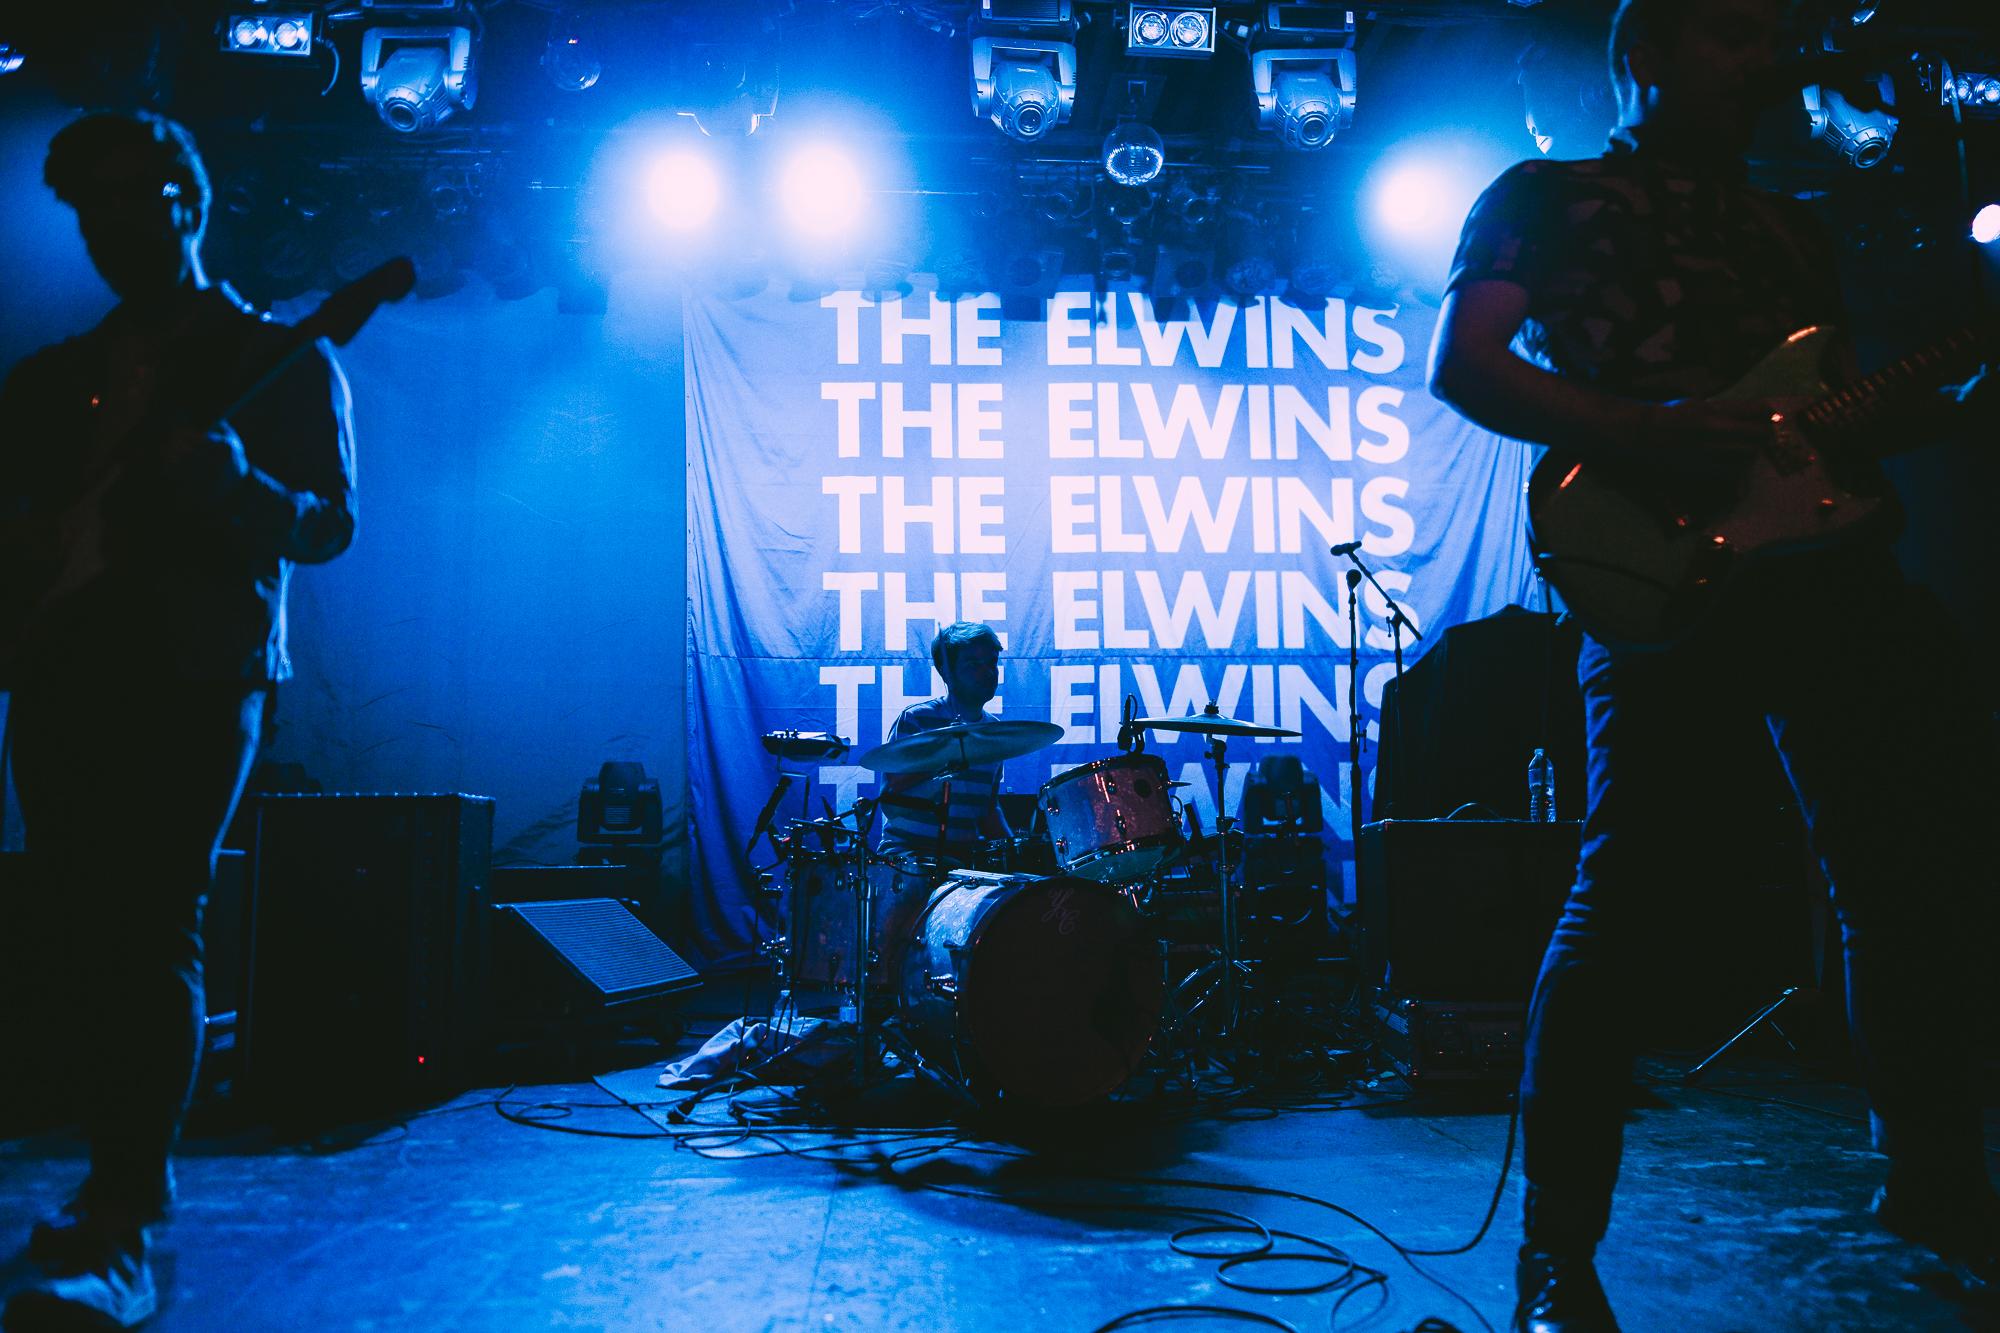 The-Elwins-9.jpg